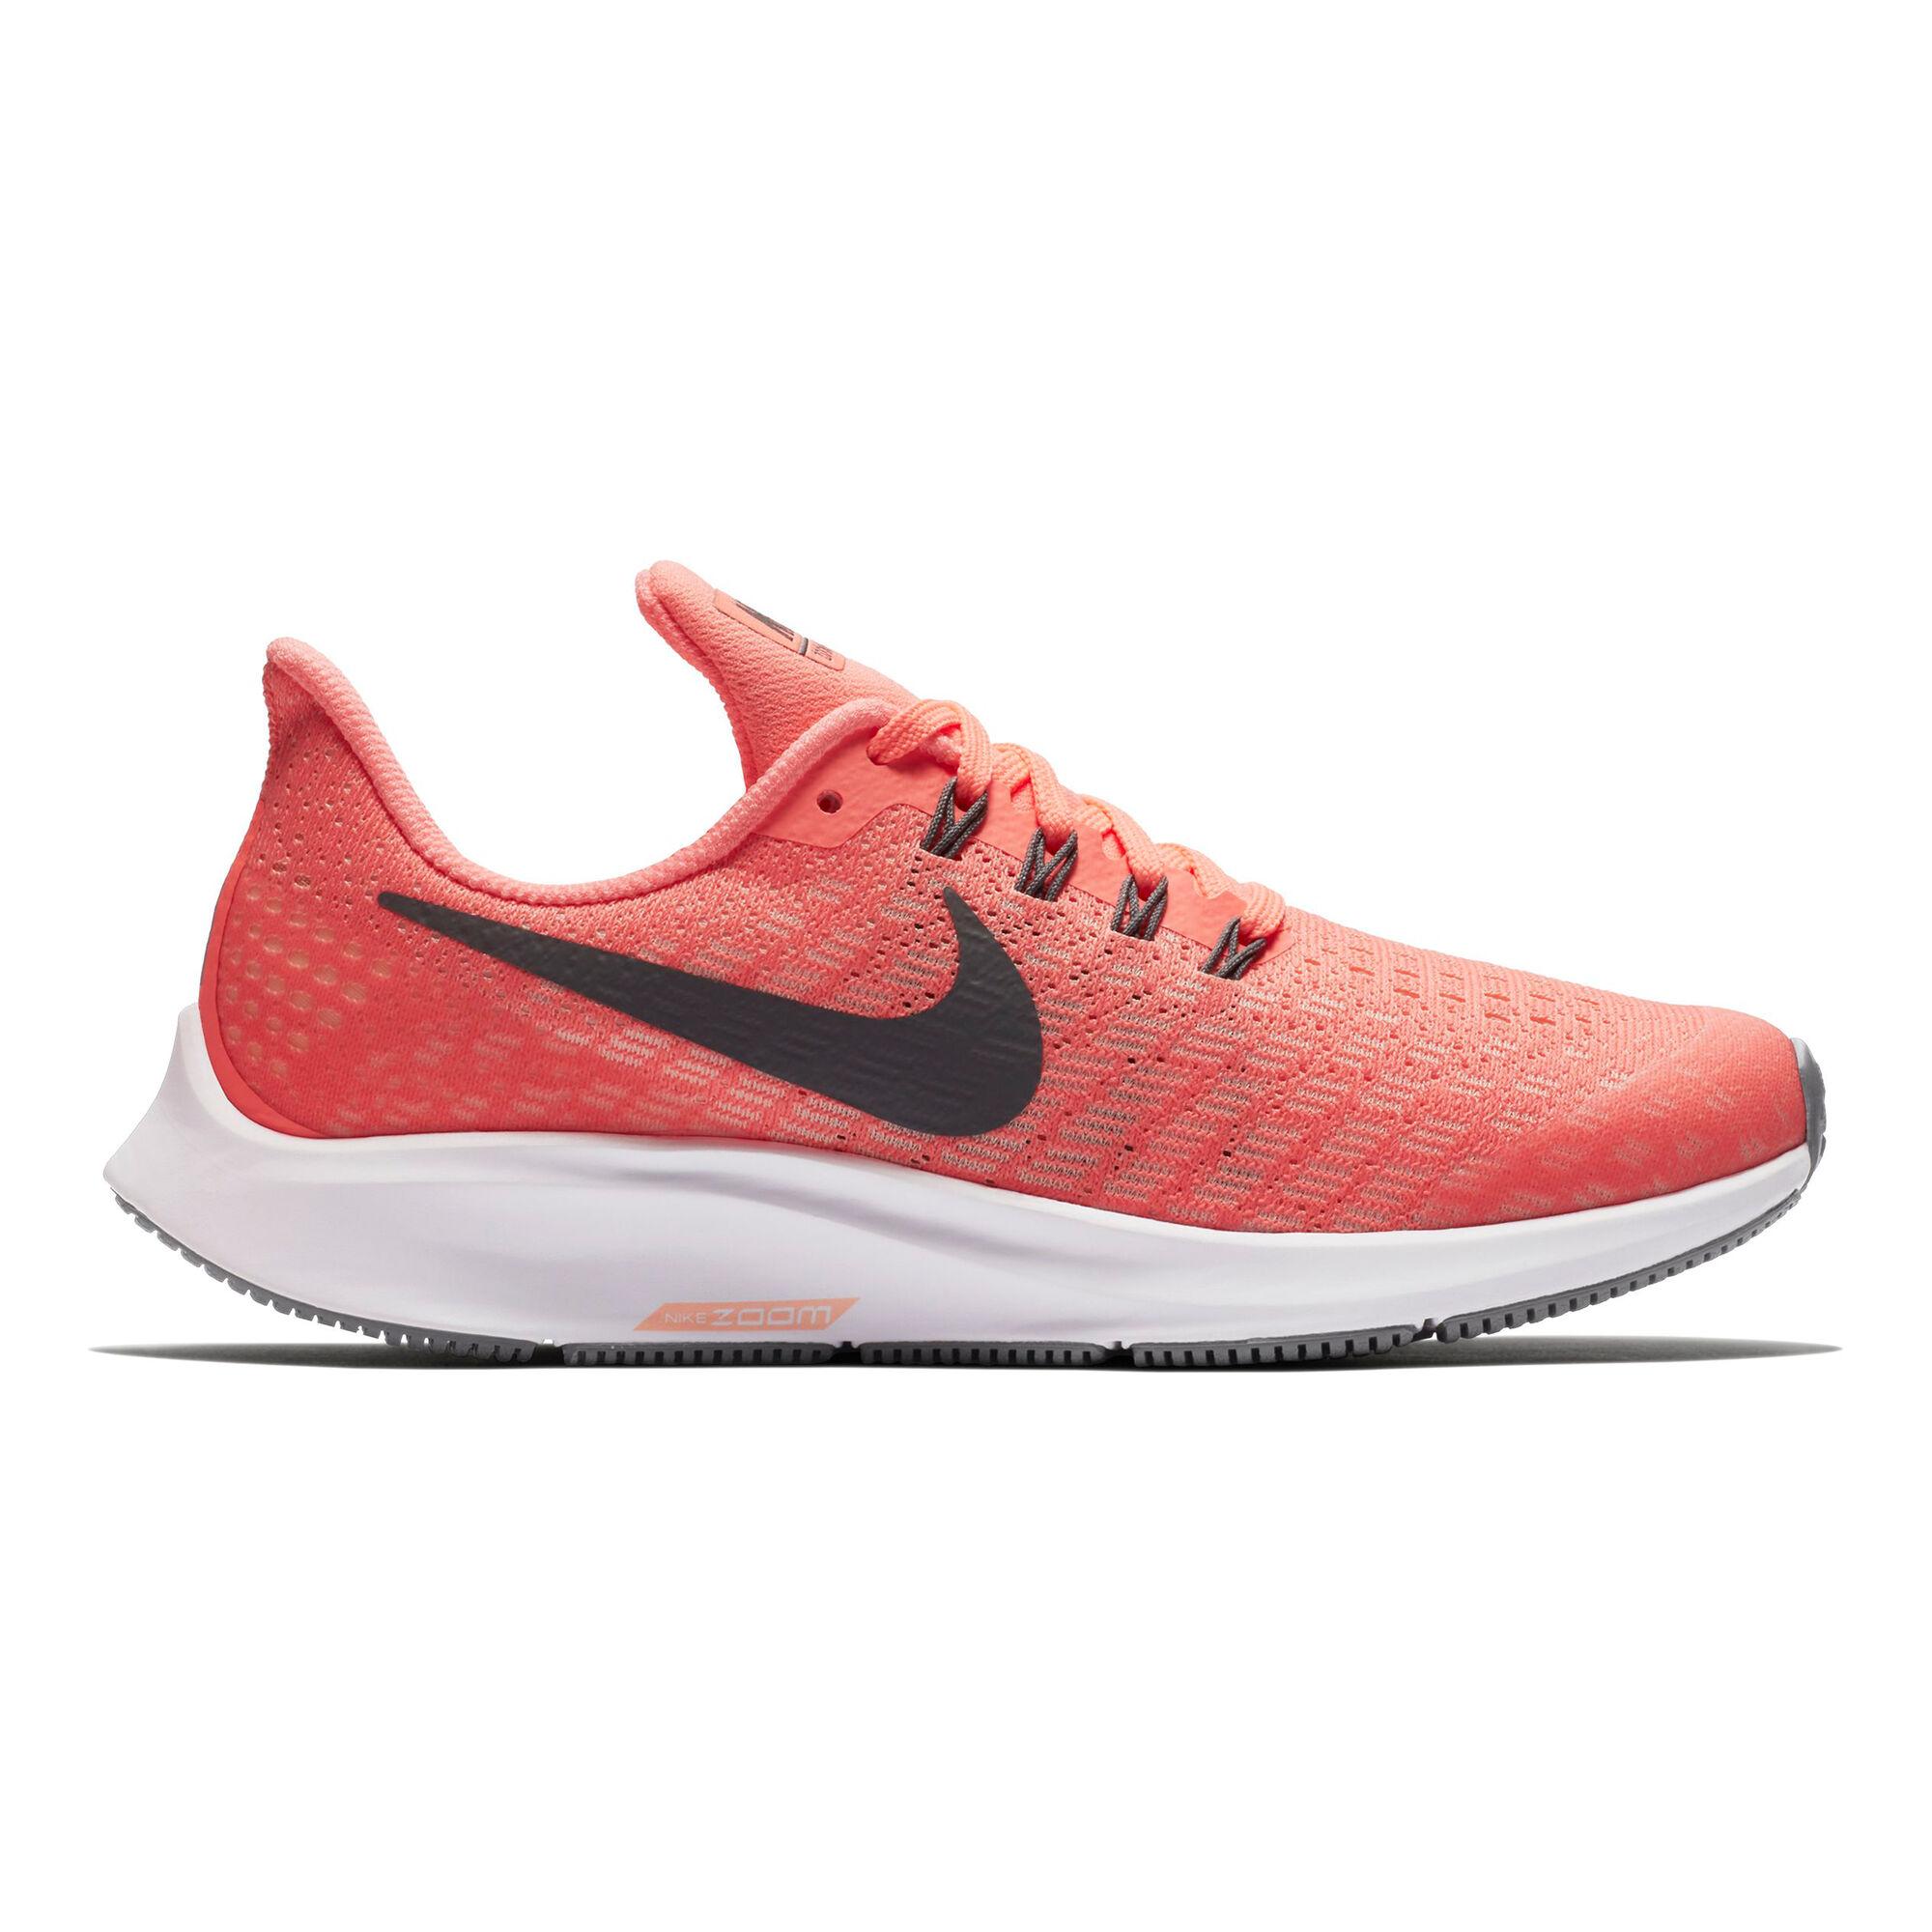 b179bd0f0a00ac Nike · Nike · Nike · Nike · Nike · Nike · Nike · Nike · Nike · Nike. Air  Zoom Pegasus 35 GS Kids ...